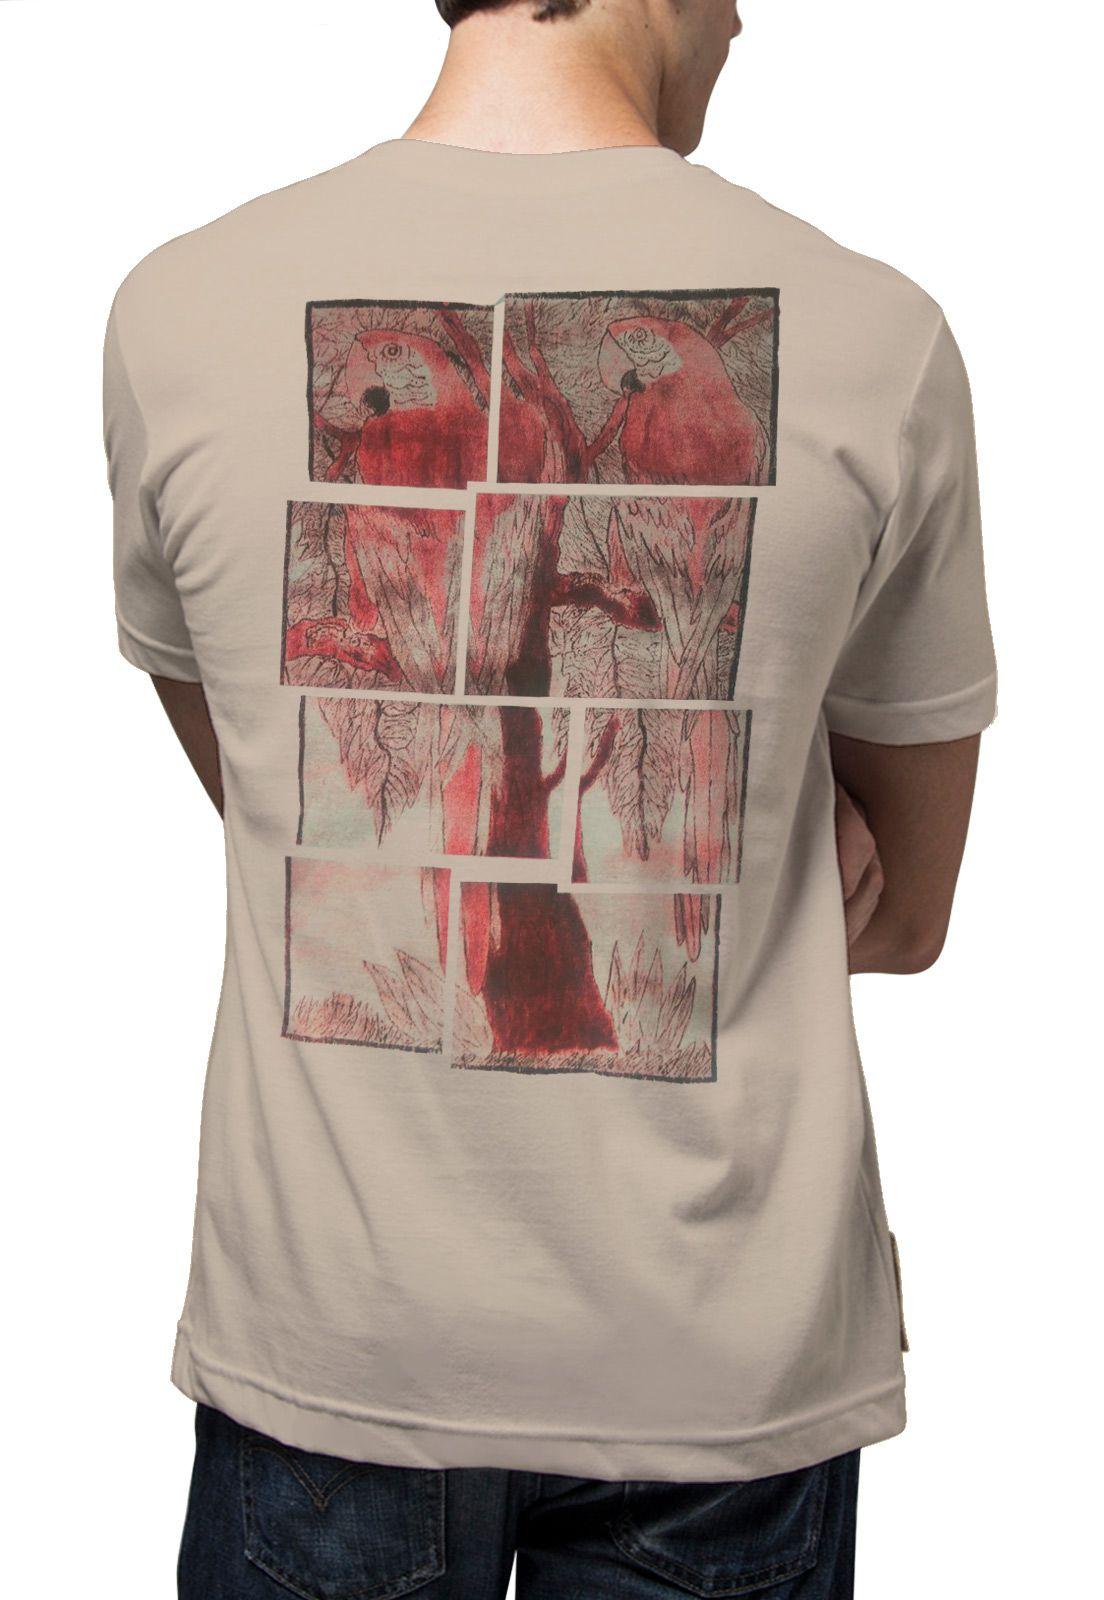 Camiseta Amazônia Quadro Araras - Bege